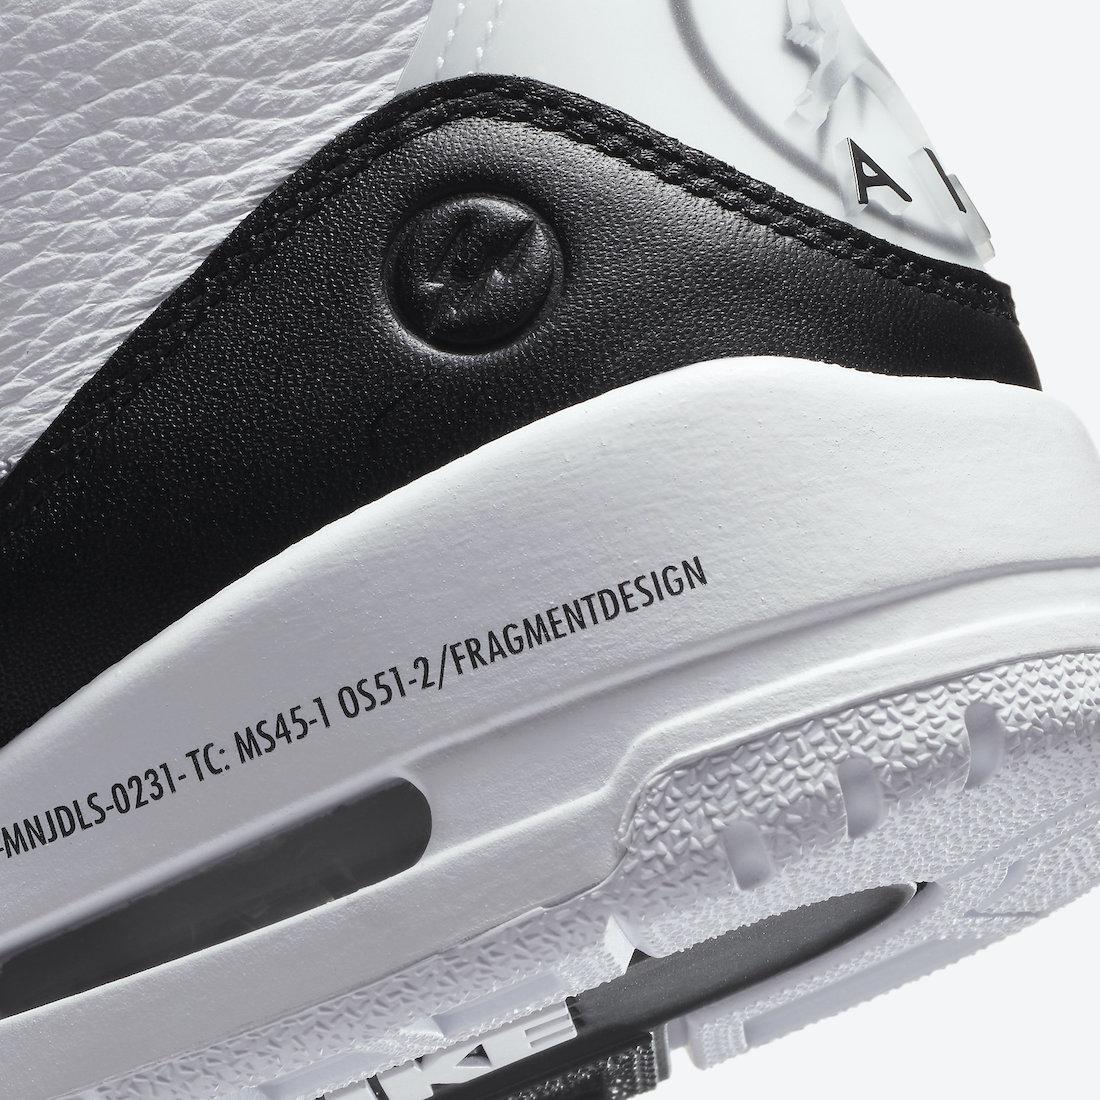 Fragment Design x Air Jordan 3 Retro SP - DA3595-100